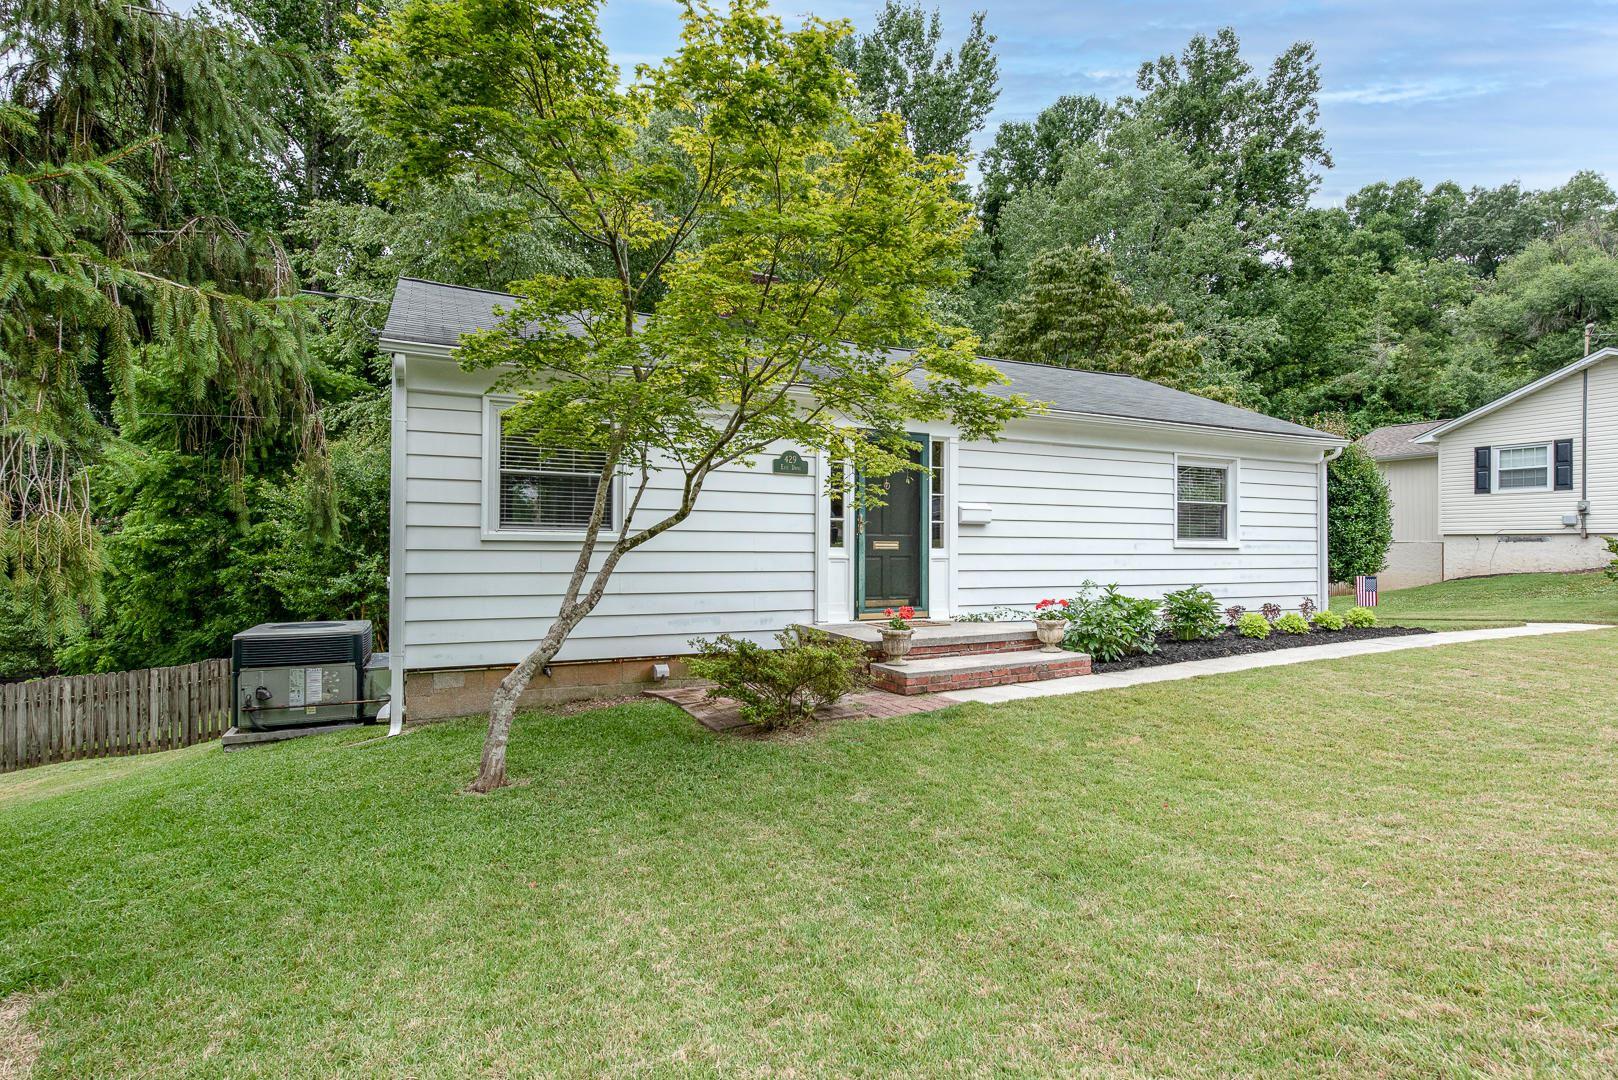 Photo of 429 East Drive, Oak Ridge, TN 37830 (MLS # 1159523)